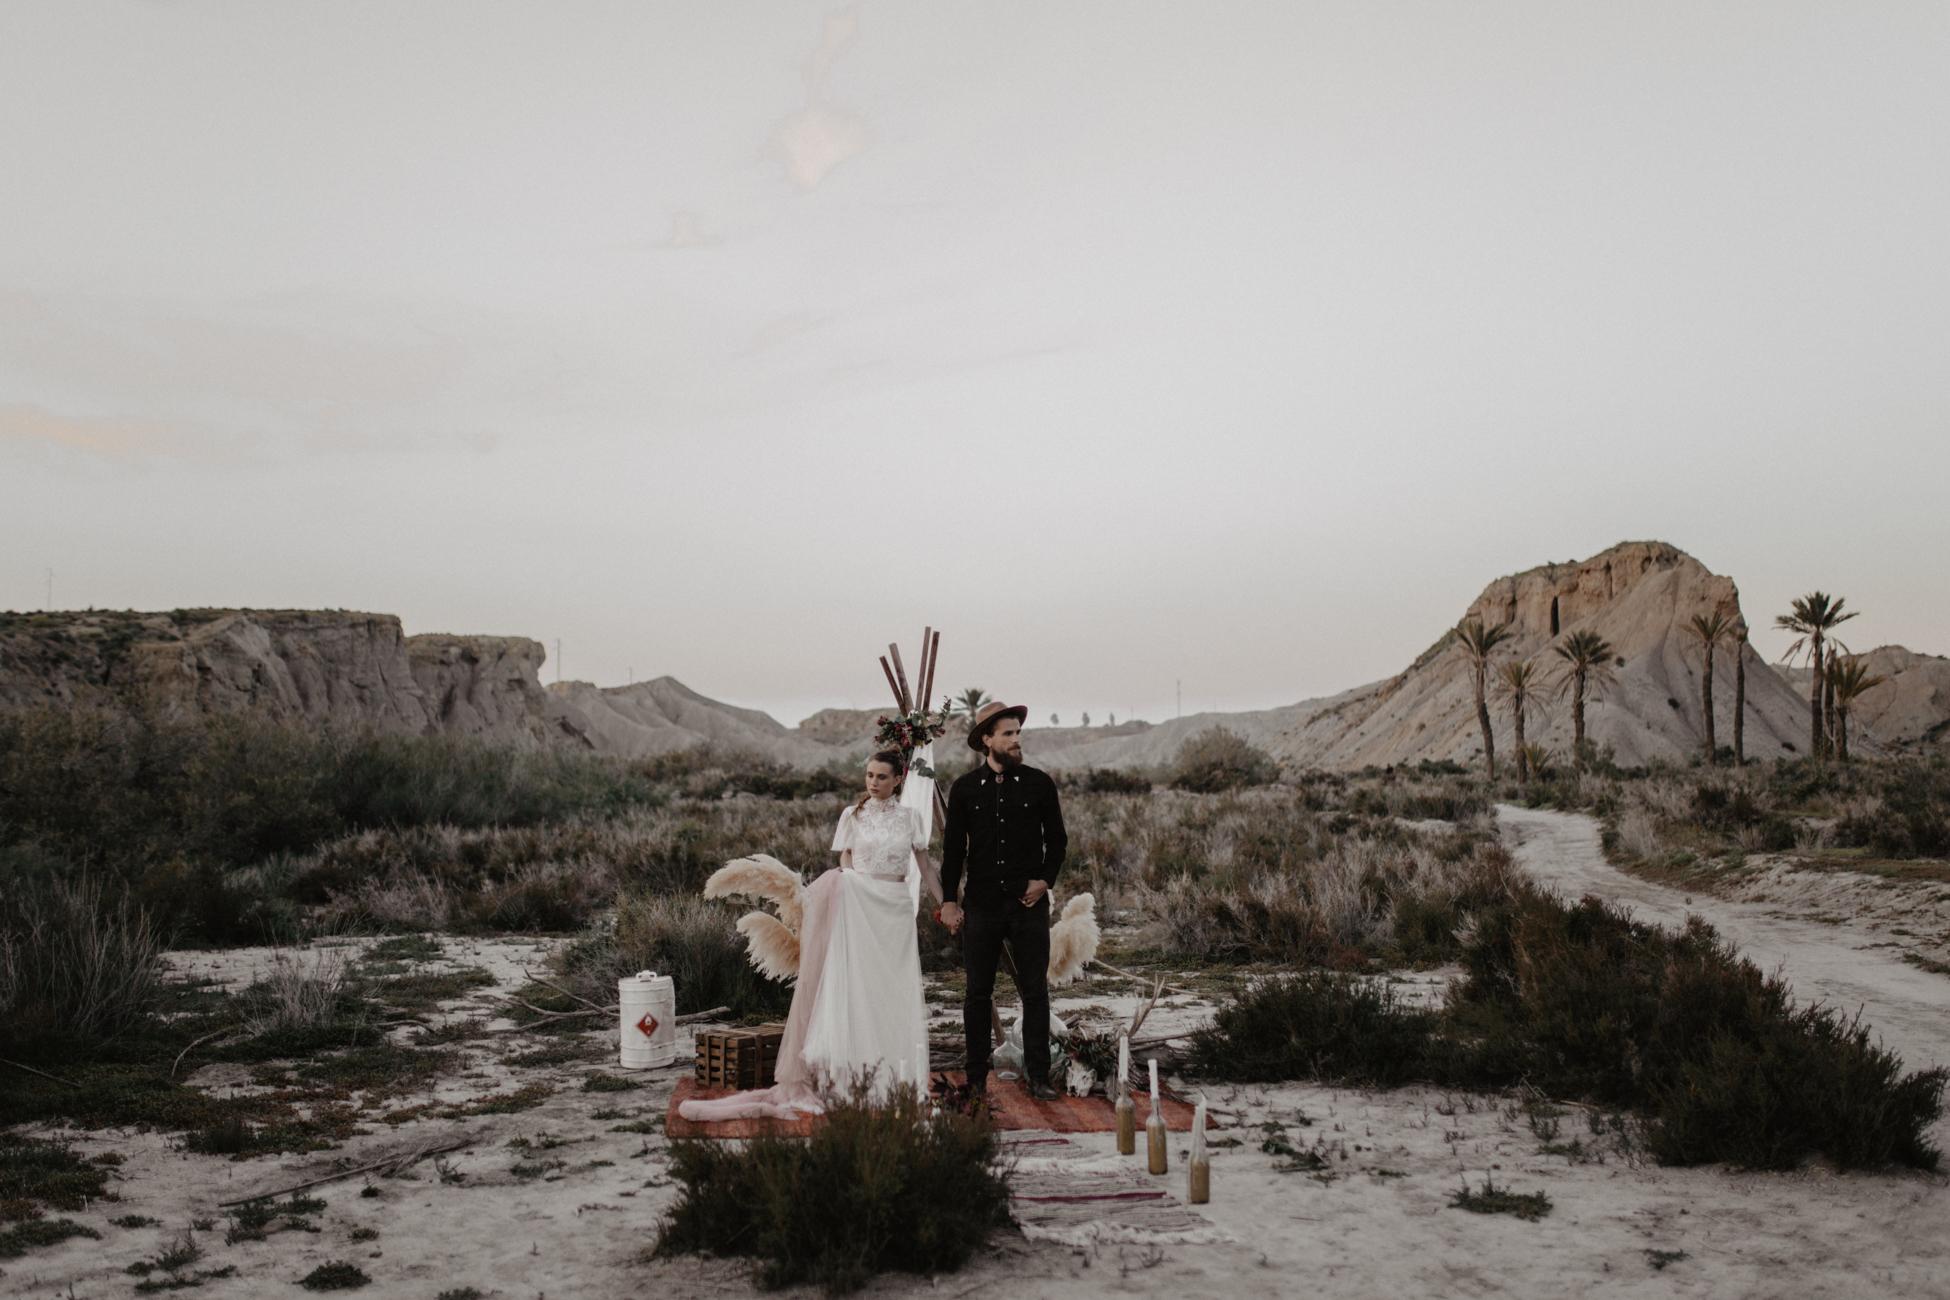 thenortherngirlphotography_photography_thenortherngirl_rebeccascabros_wedding_weddingphotography_weddingphotographer_wood_muebles_deco_bodasdecaramelo_home_bedtime_gaywedding_editorial_desierto_desert_wildestdreams_amortexano-397.jpg